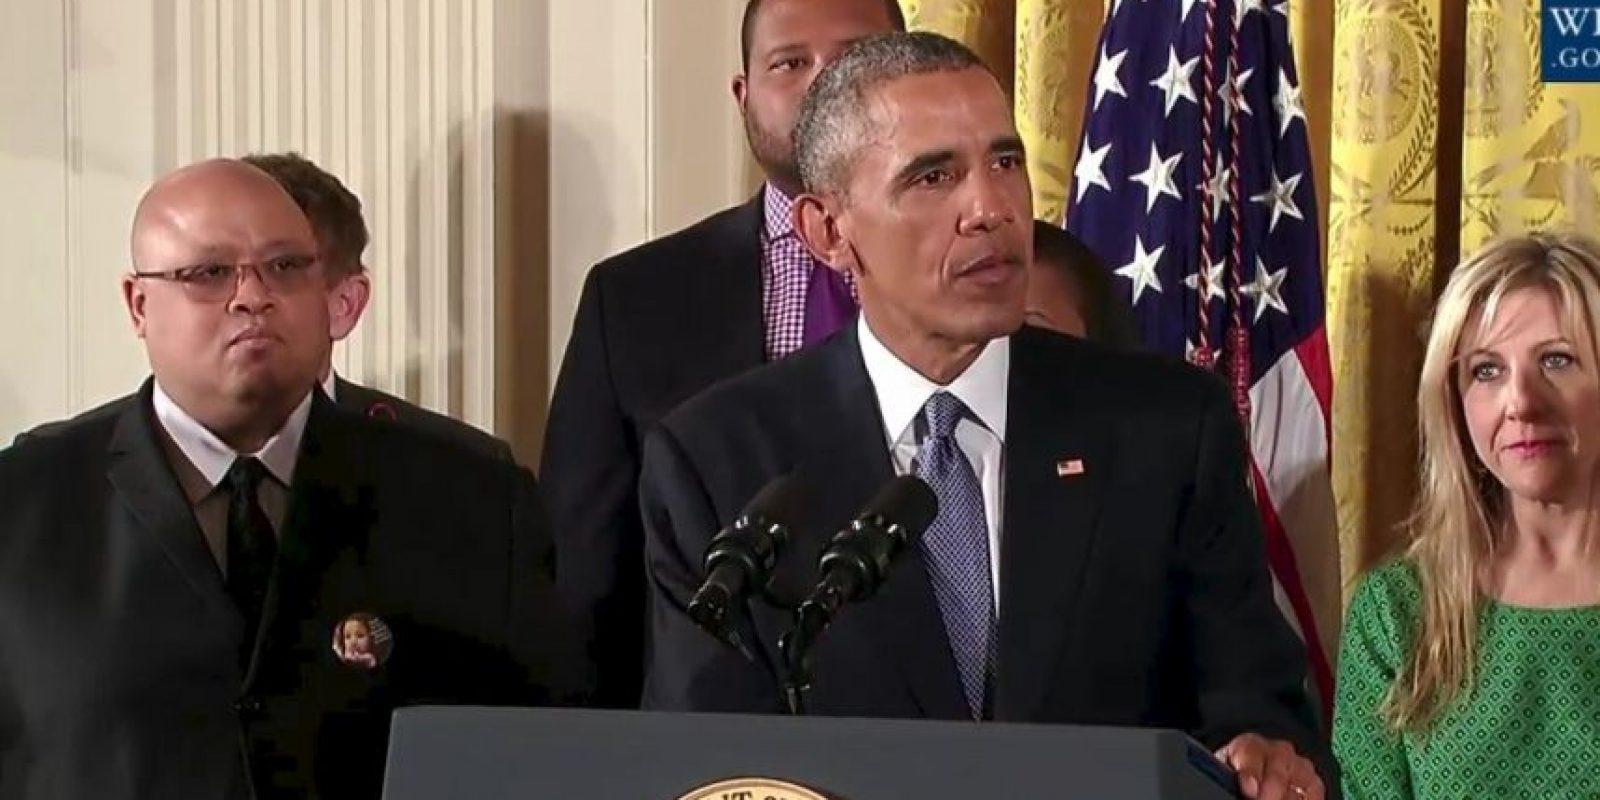 El presidente estadounidense Barack Obama, aseguró que las medidas salvarán vidas. Foto:White House